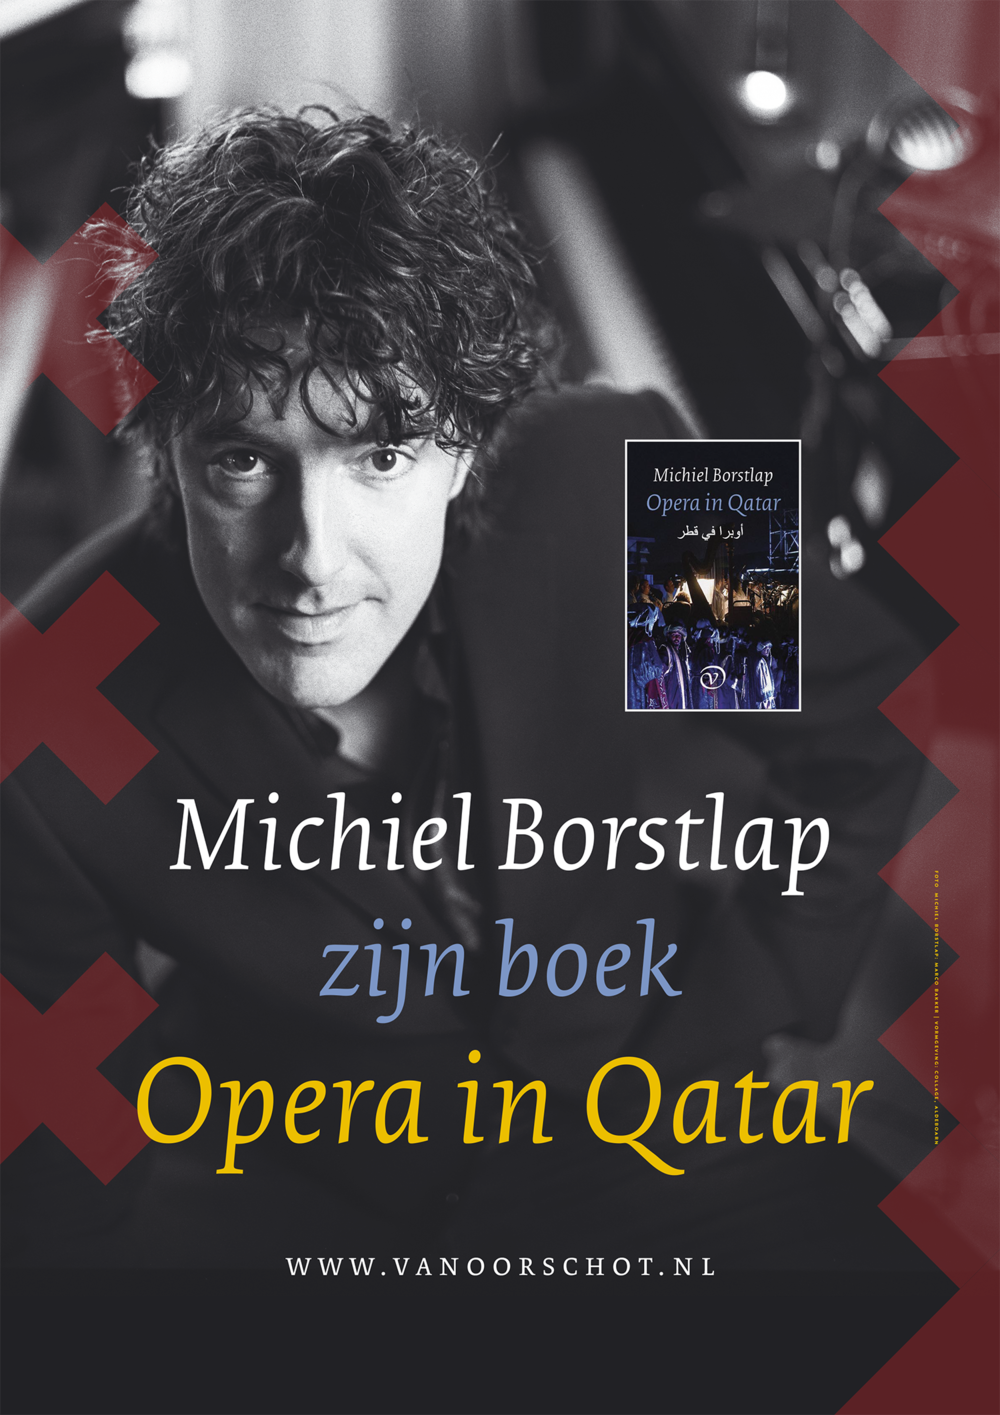 A0 Michiel Borstlap Opera in Qatar.png